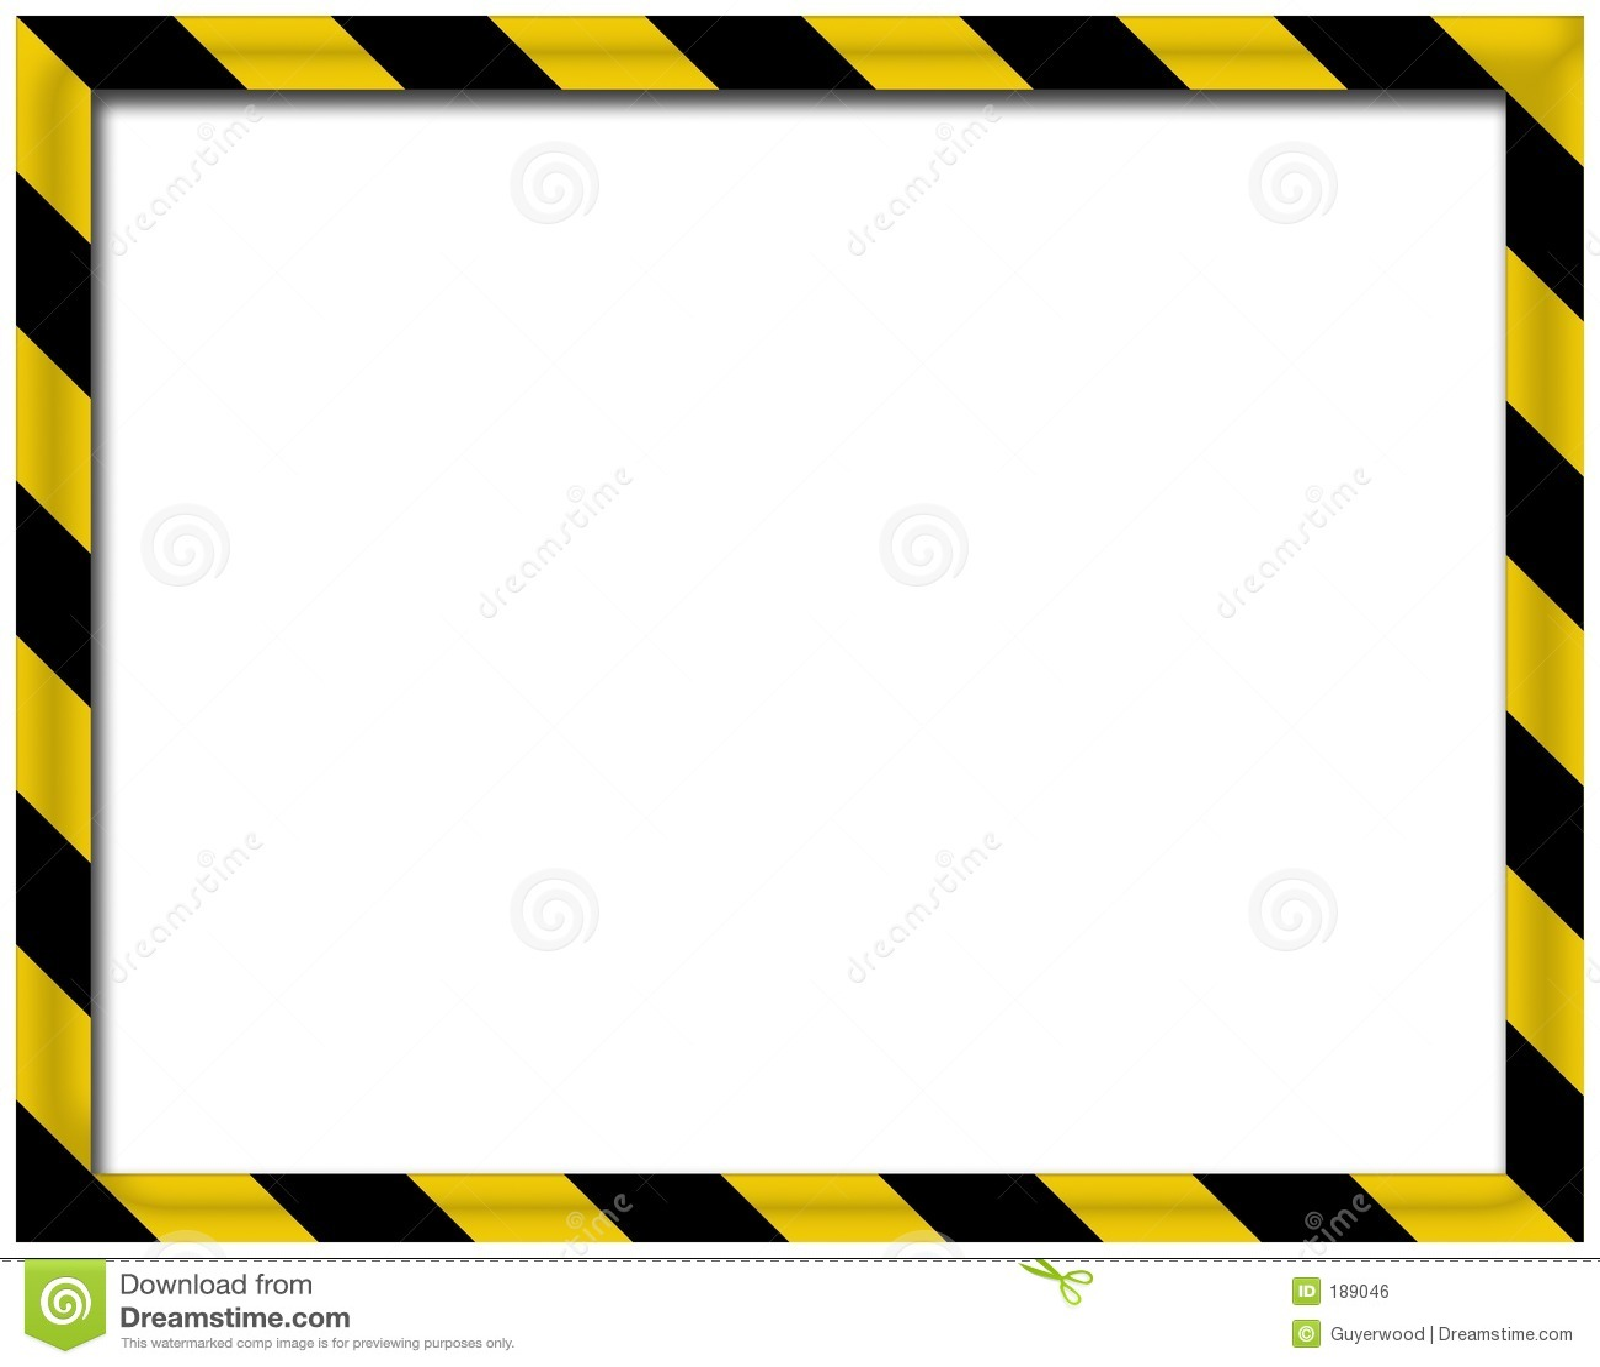 blank 3d frame